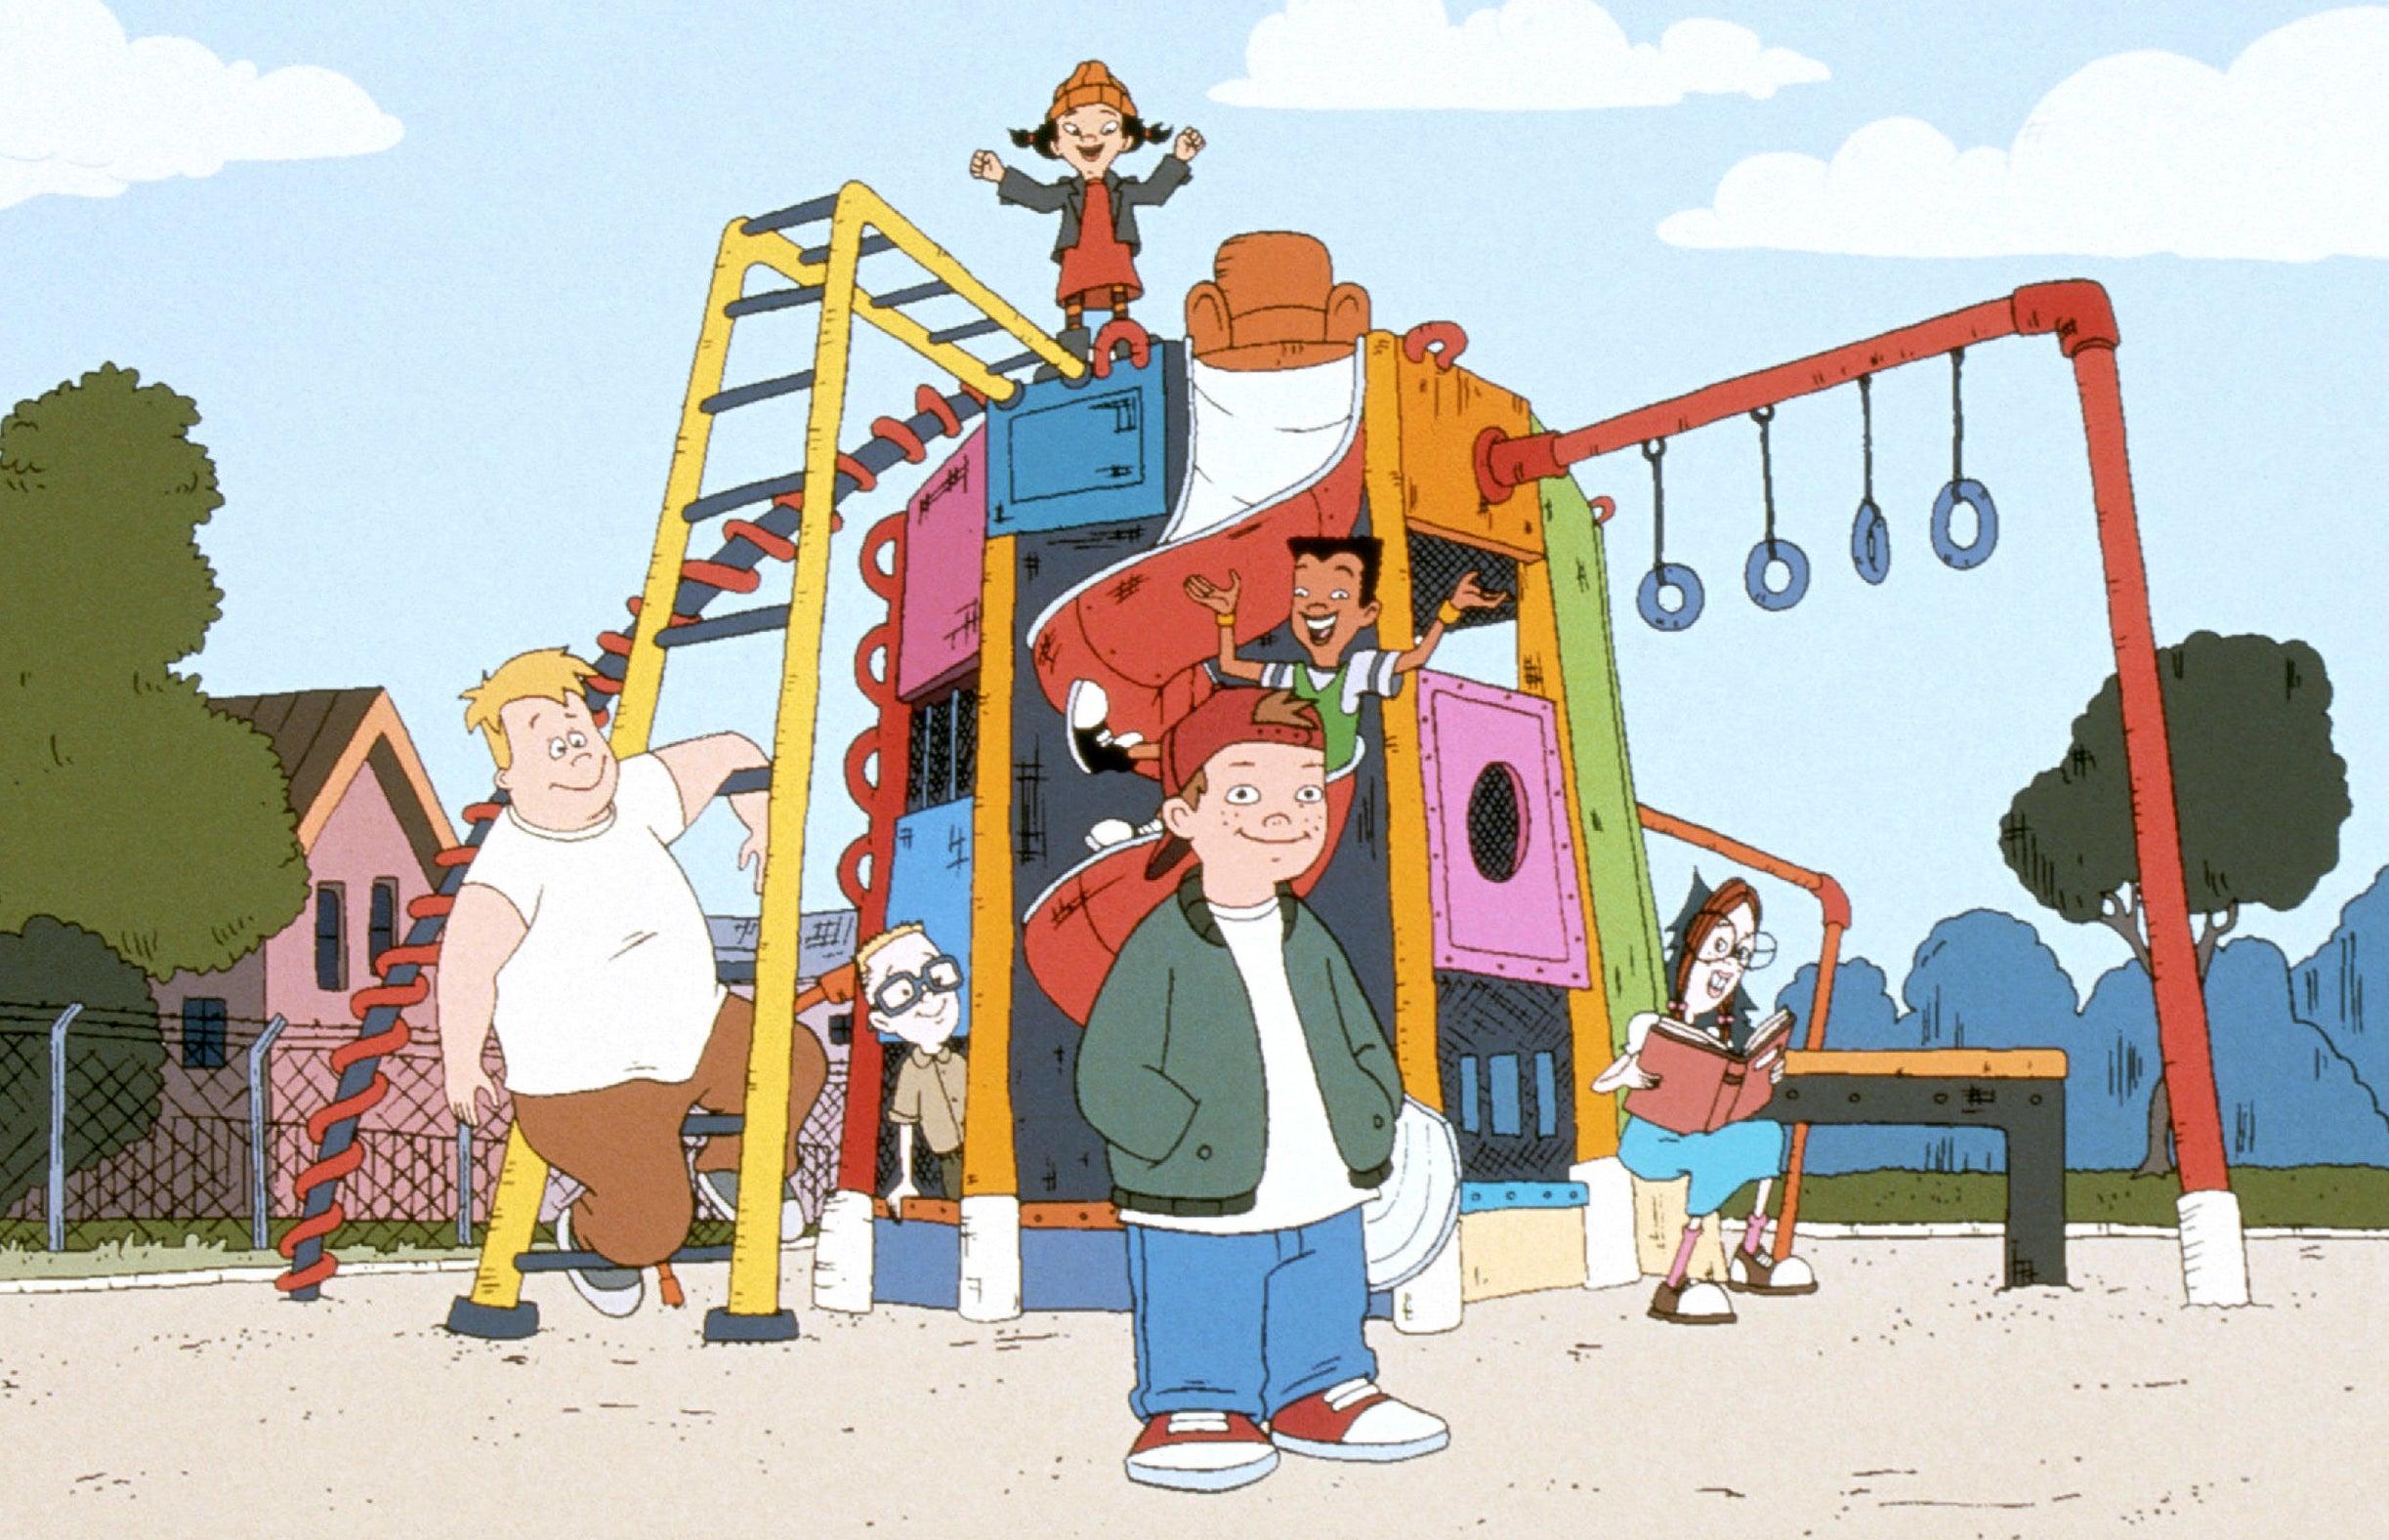 A publicity photo from Disney's Recess cartoon